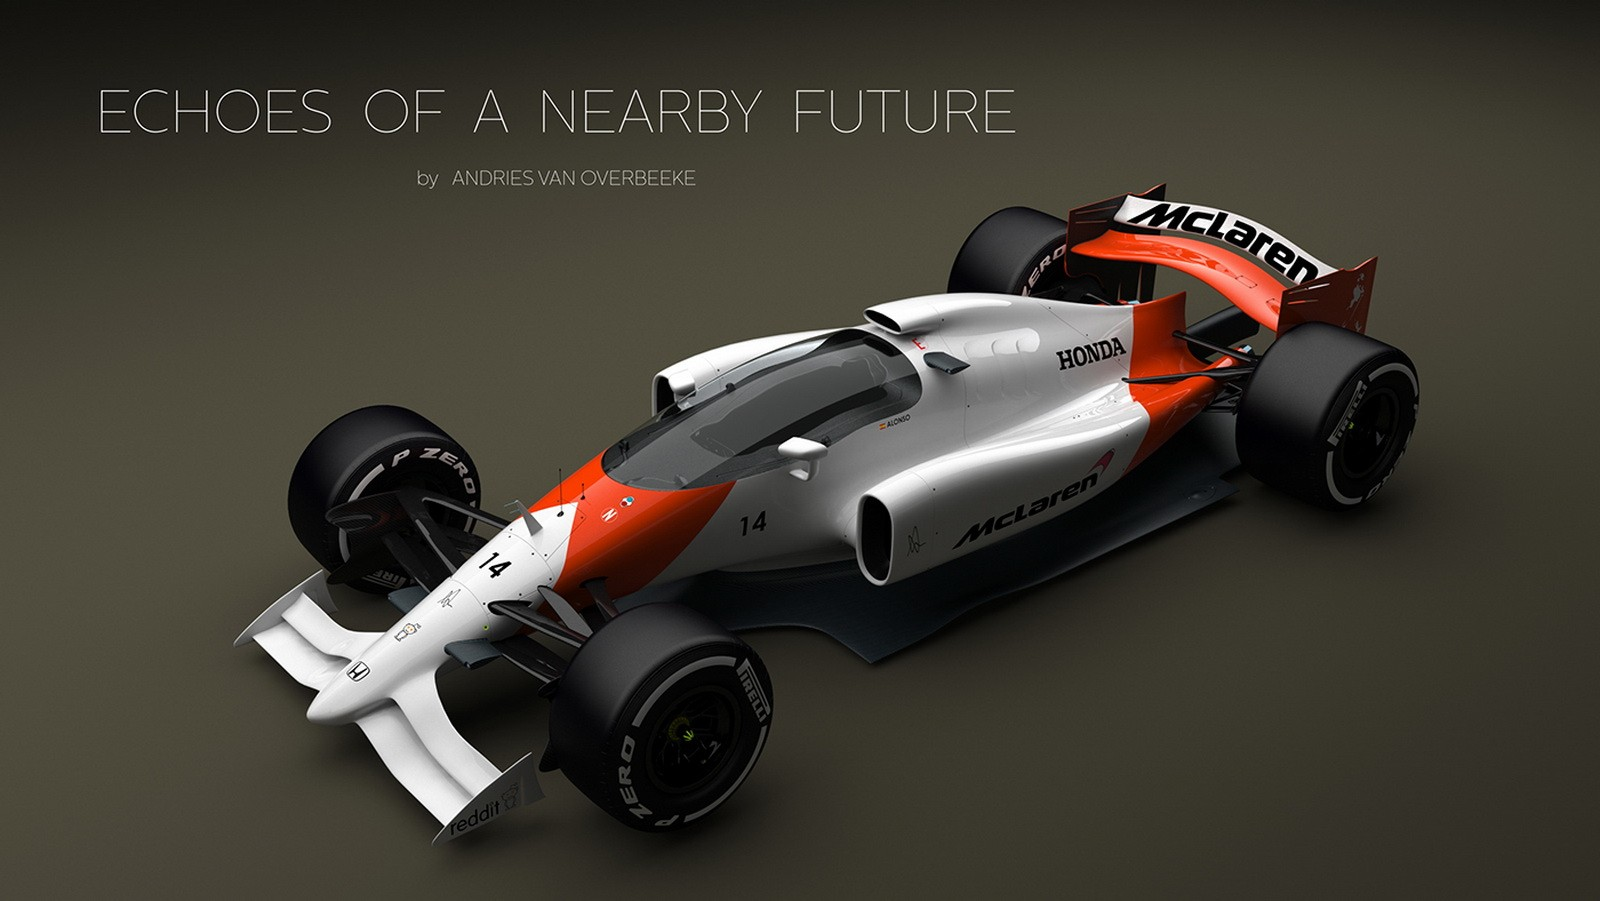 future-formula-1-concept-earns-closed-cockpit-honda-mclaren-livery-photo-gallery_2